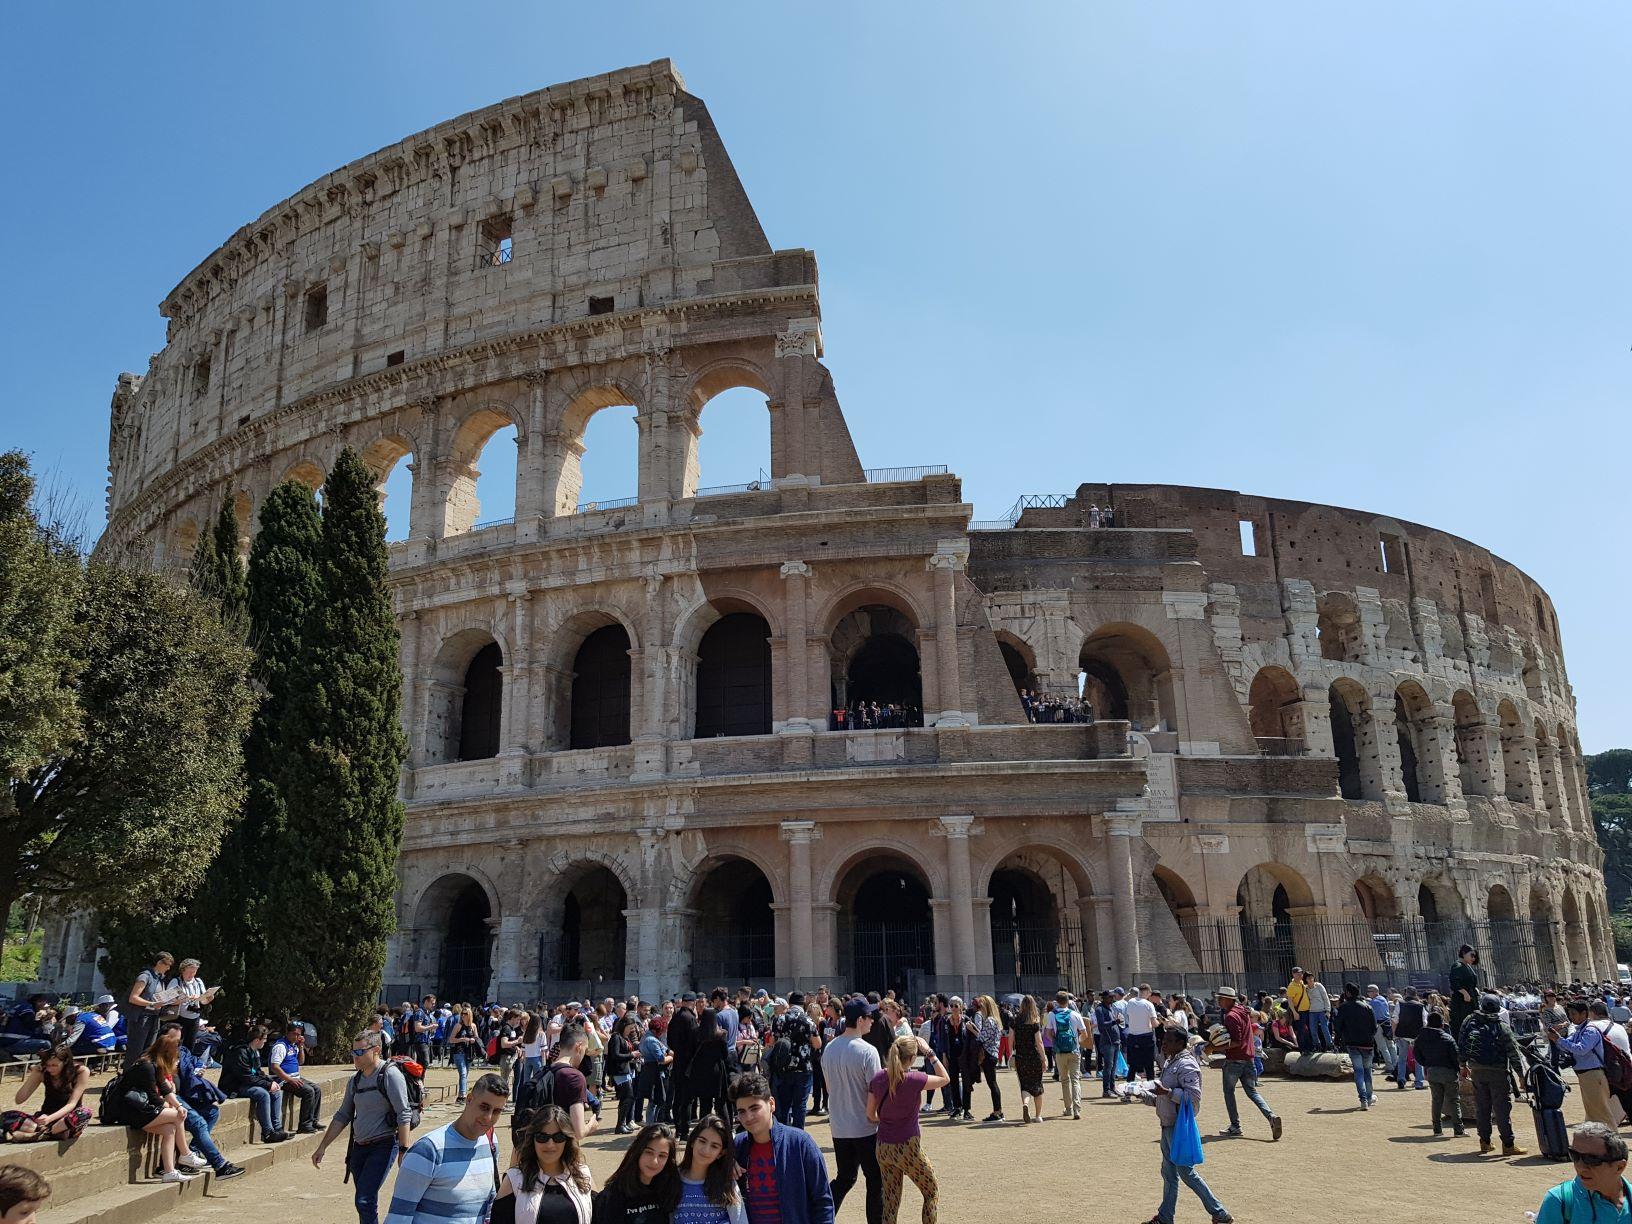 Colosseum_Ancient Rome (9)